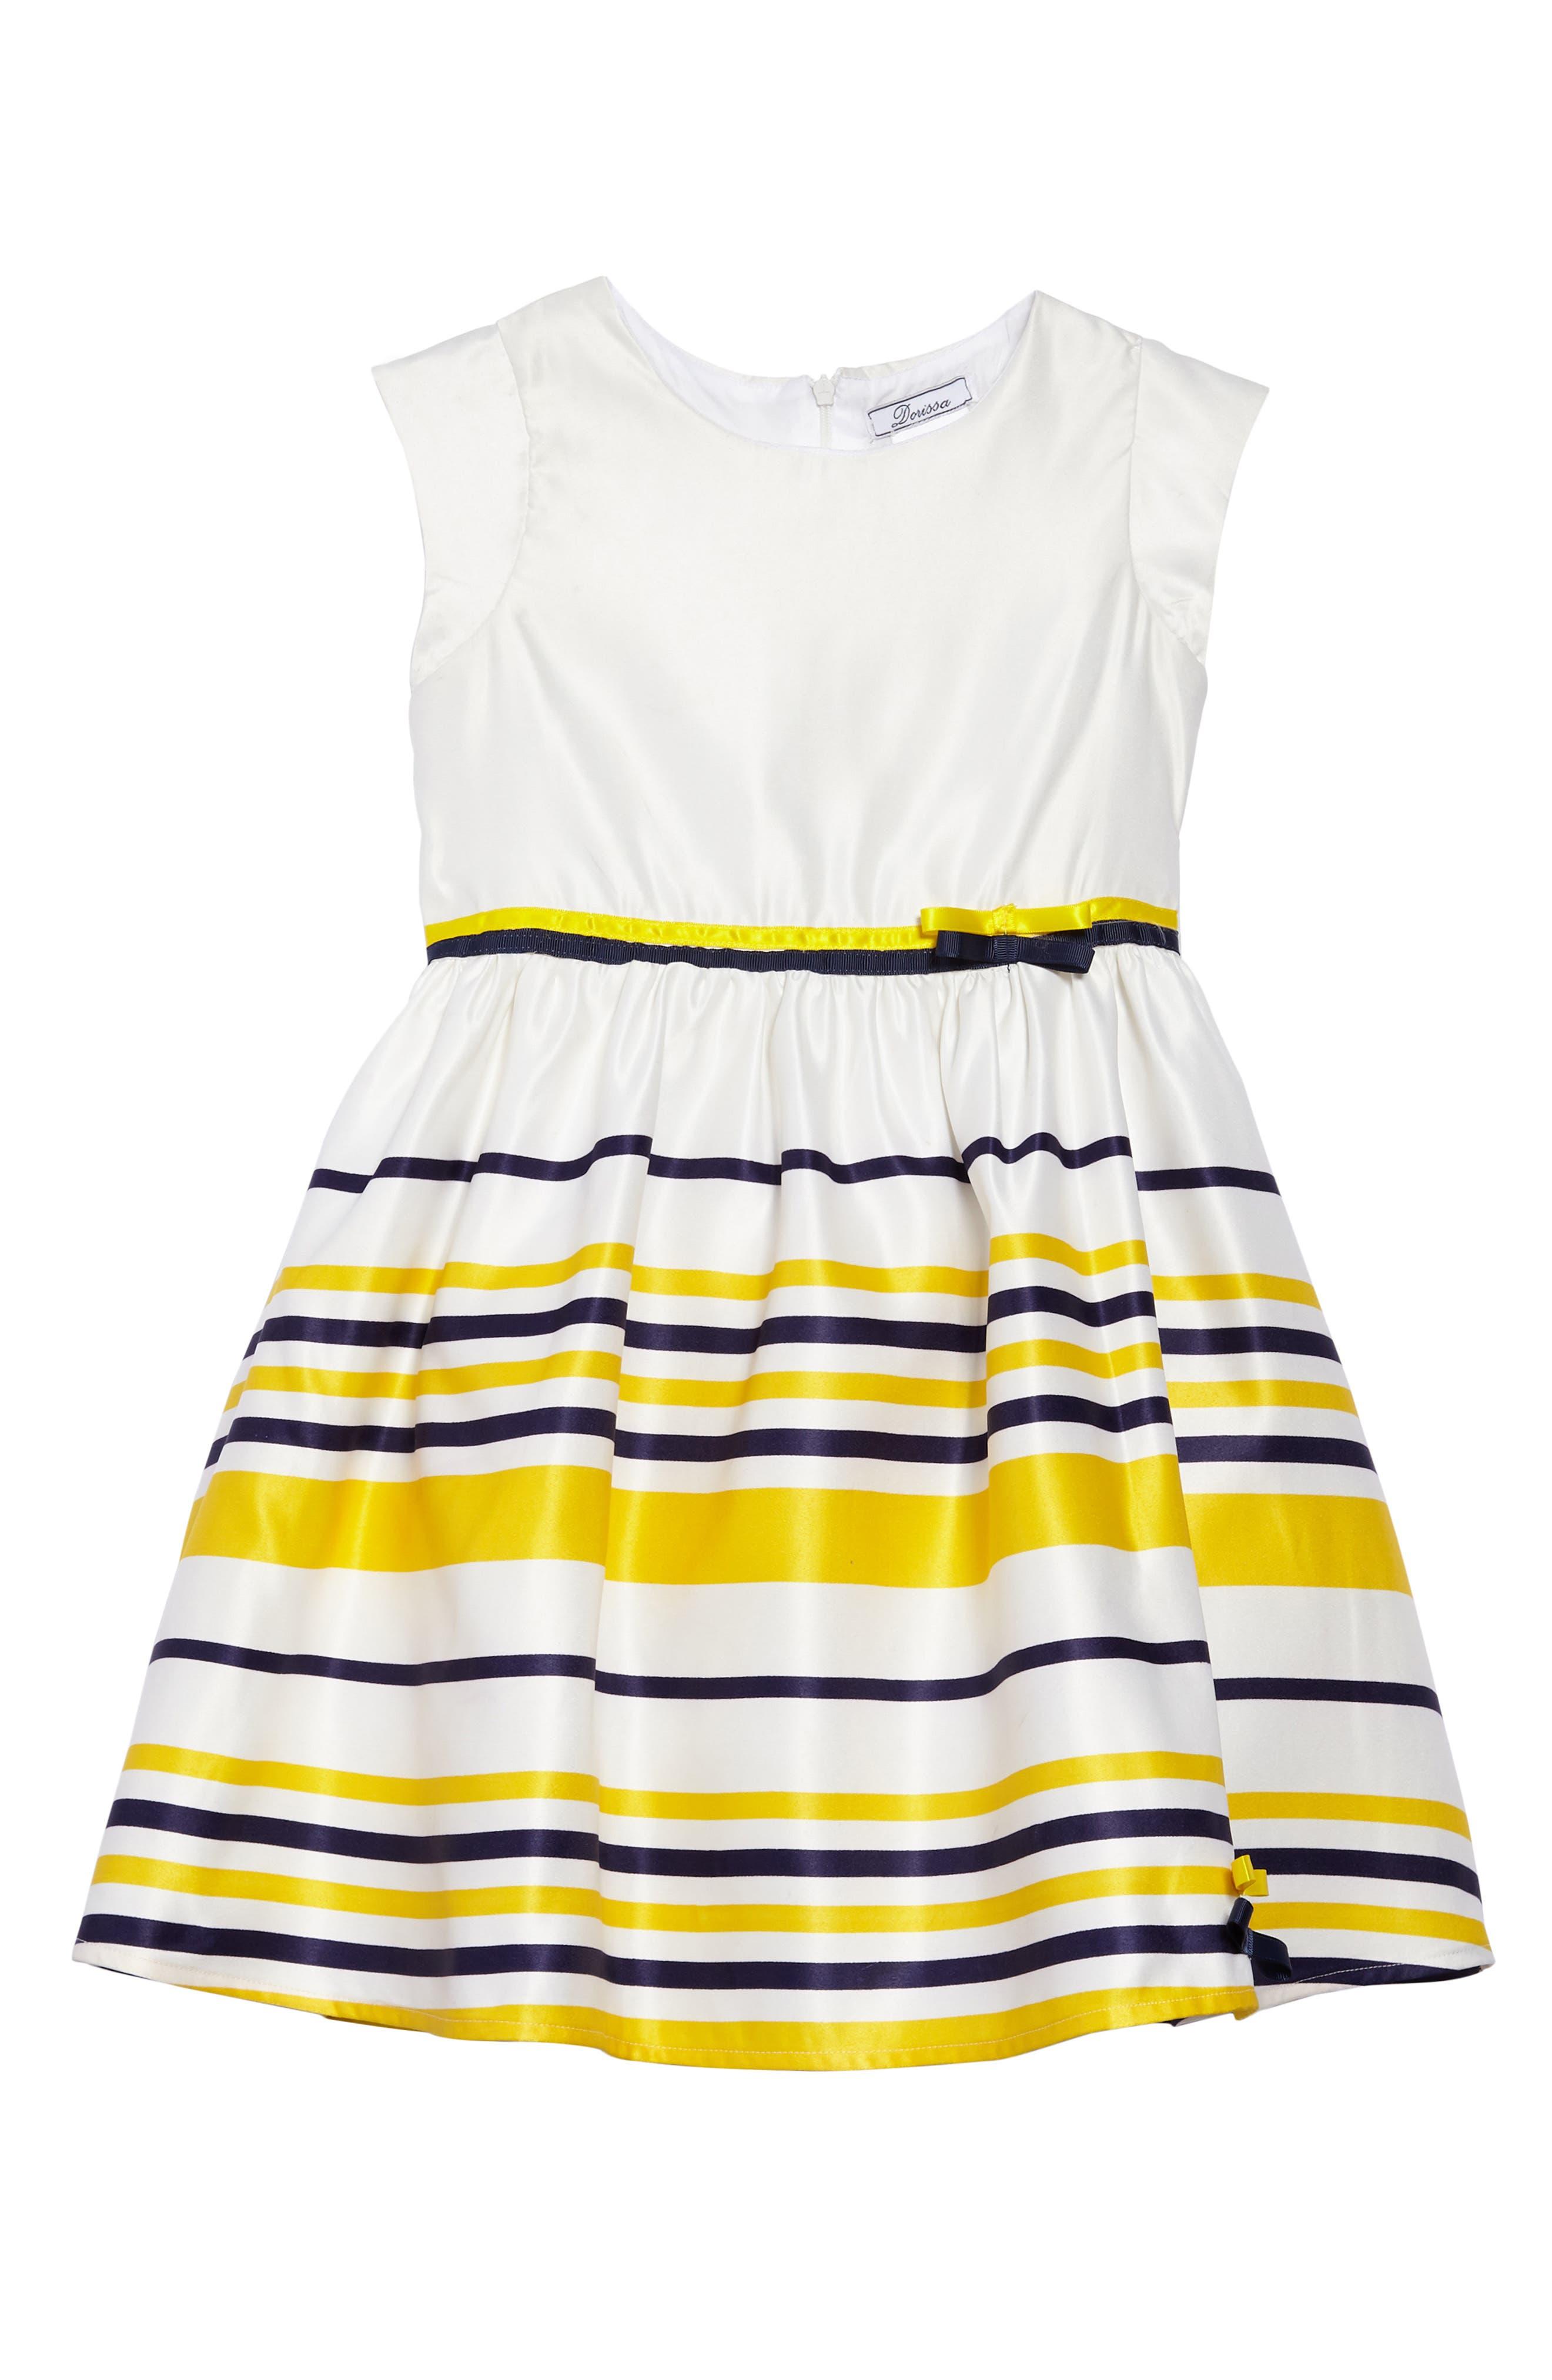 Carly Sleeveless Dress,                         Main,                         color, White/ Multi